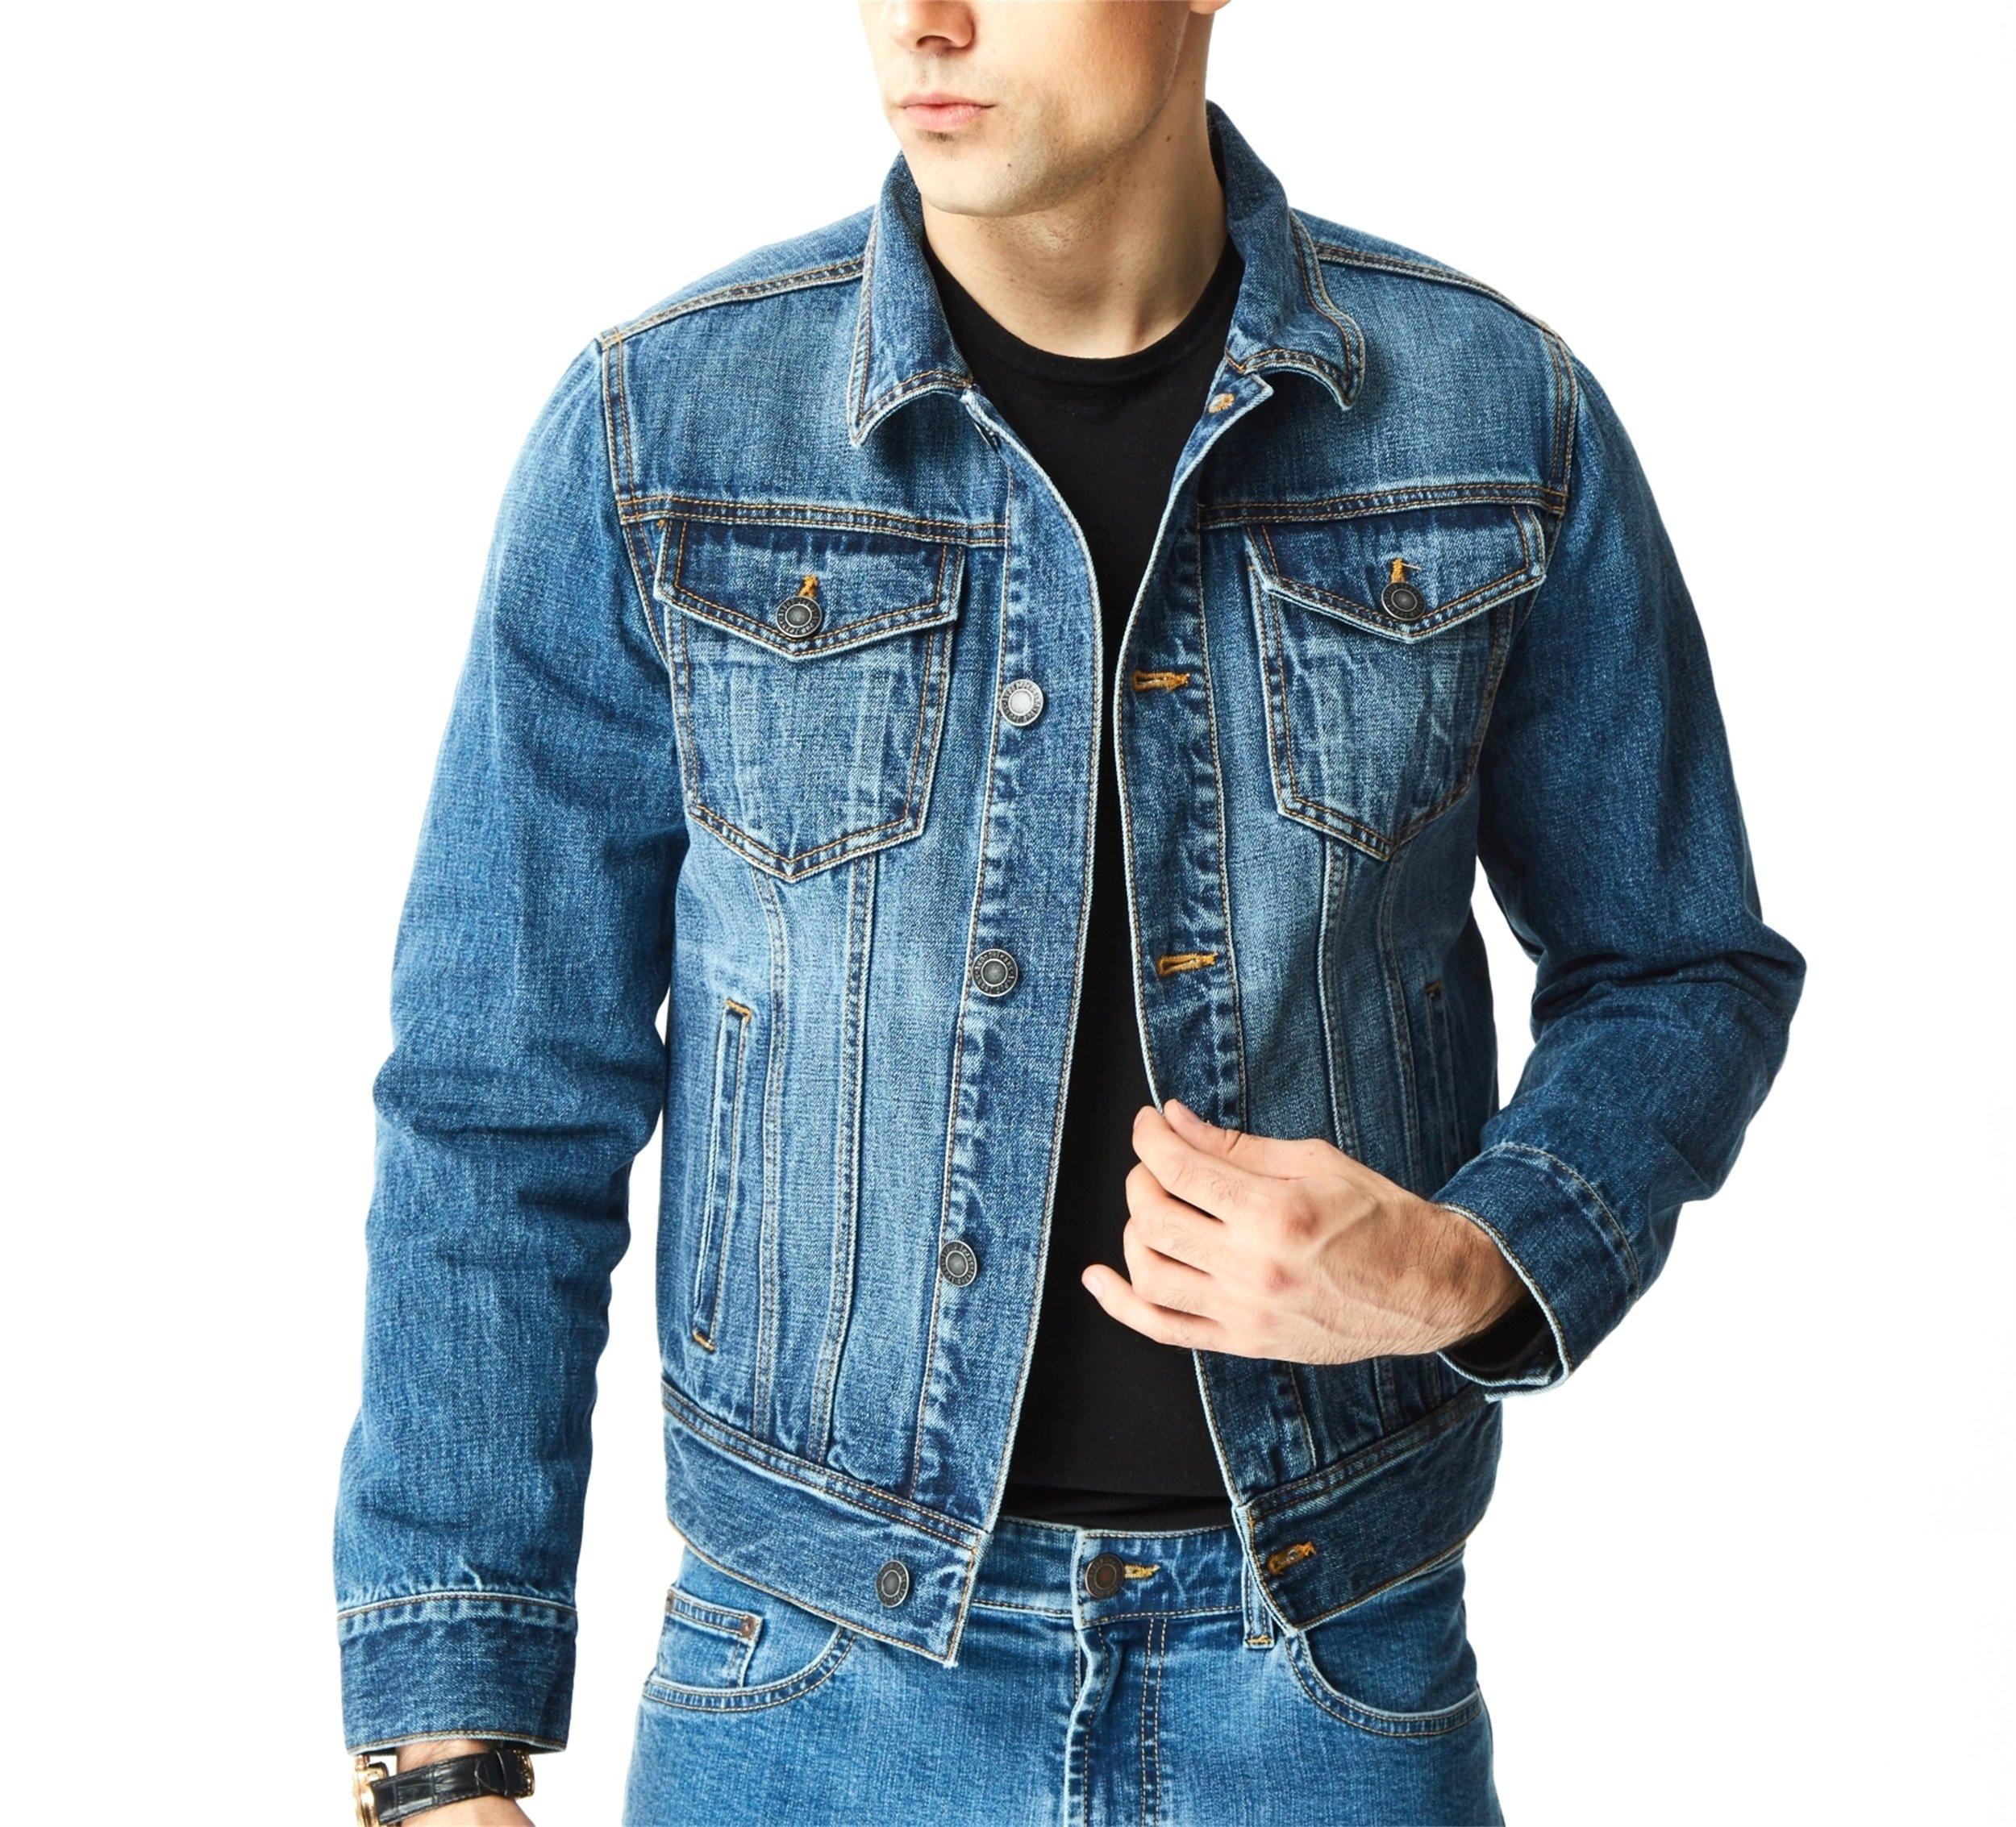 Aspop Jeans Men's Regular-Fit Jean Jacket L Dark Stone Wash